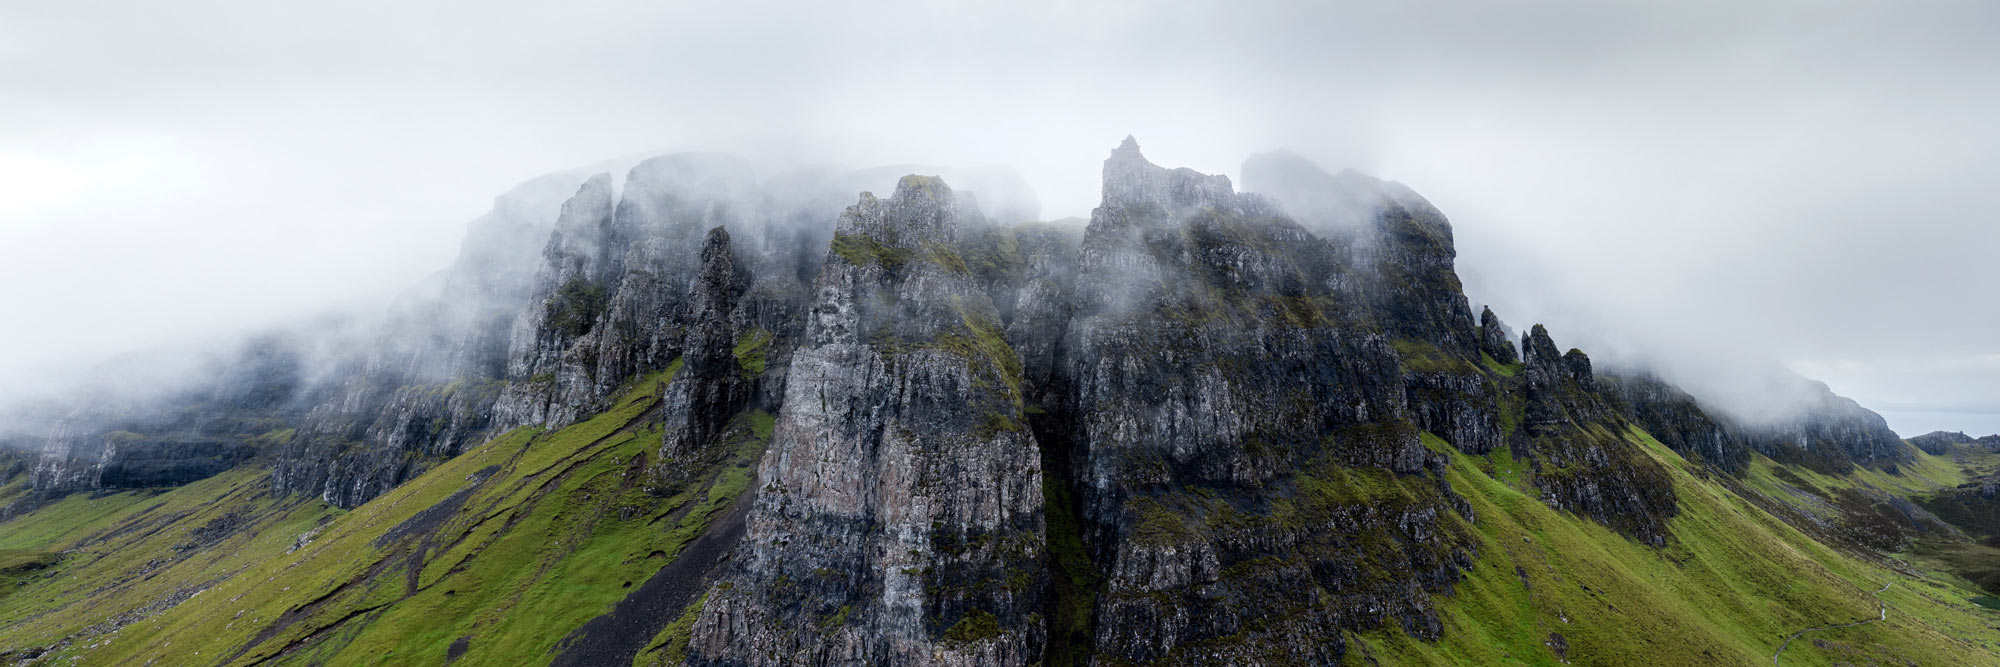 Panoramic print of mist over he Quiraing on the isle of Skye